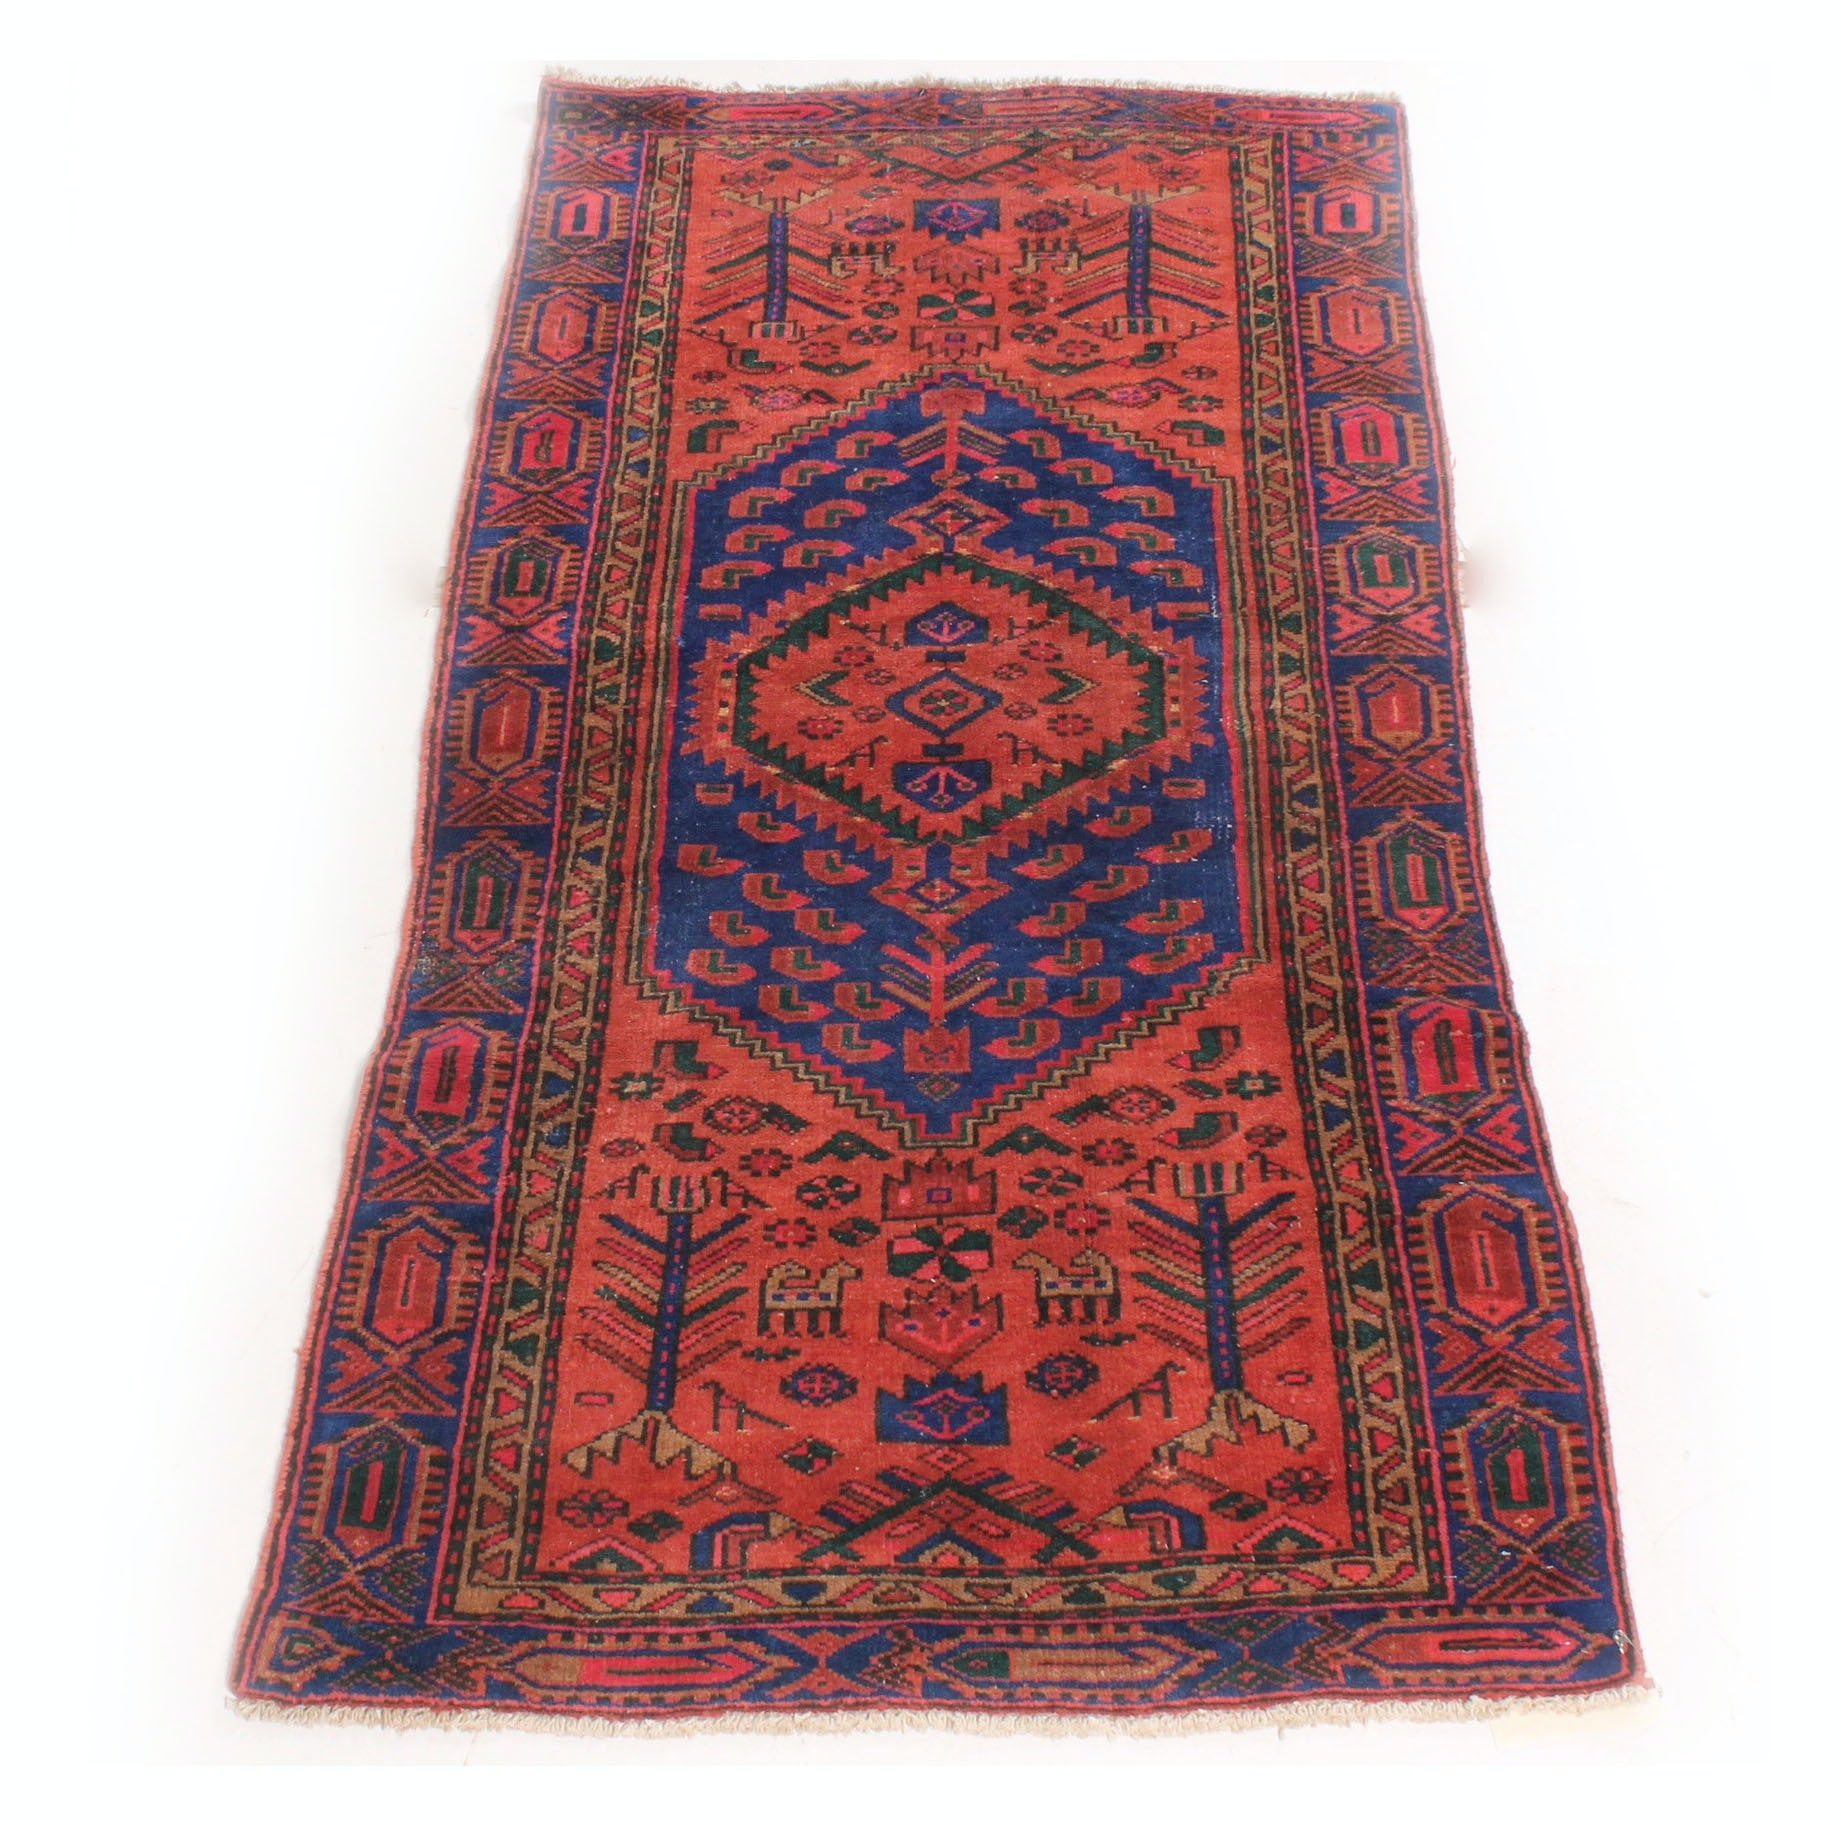 Vintage Hand Knotted Persian Kurdish Bijar Rug